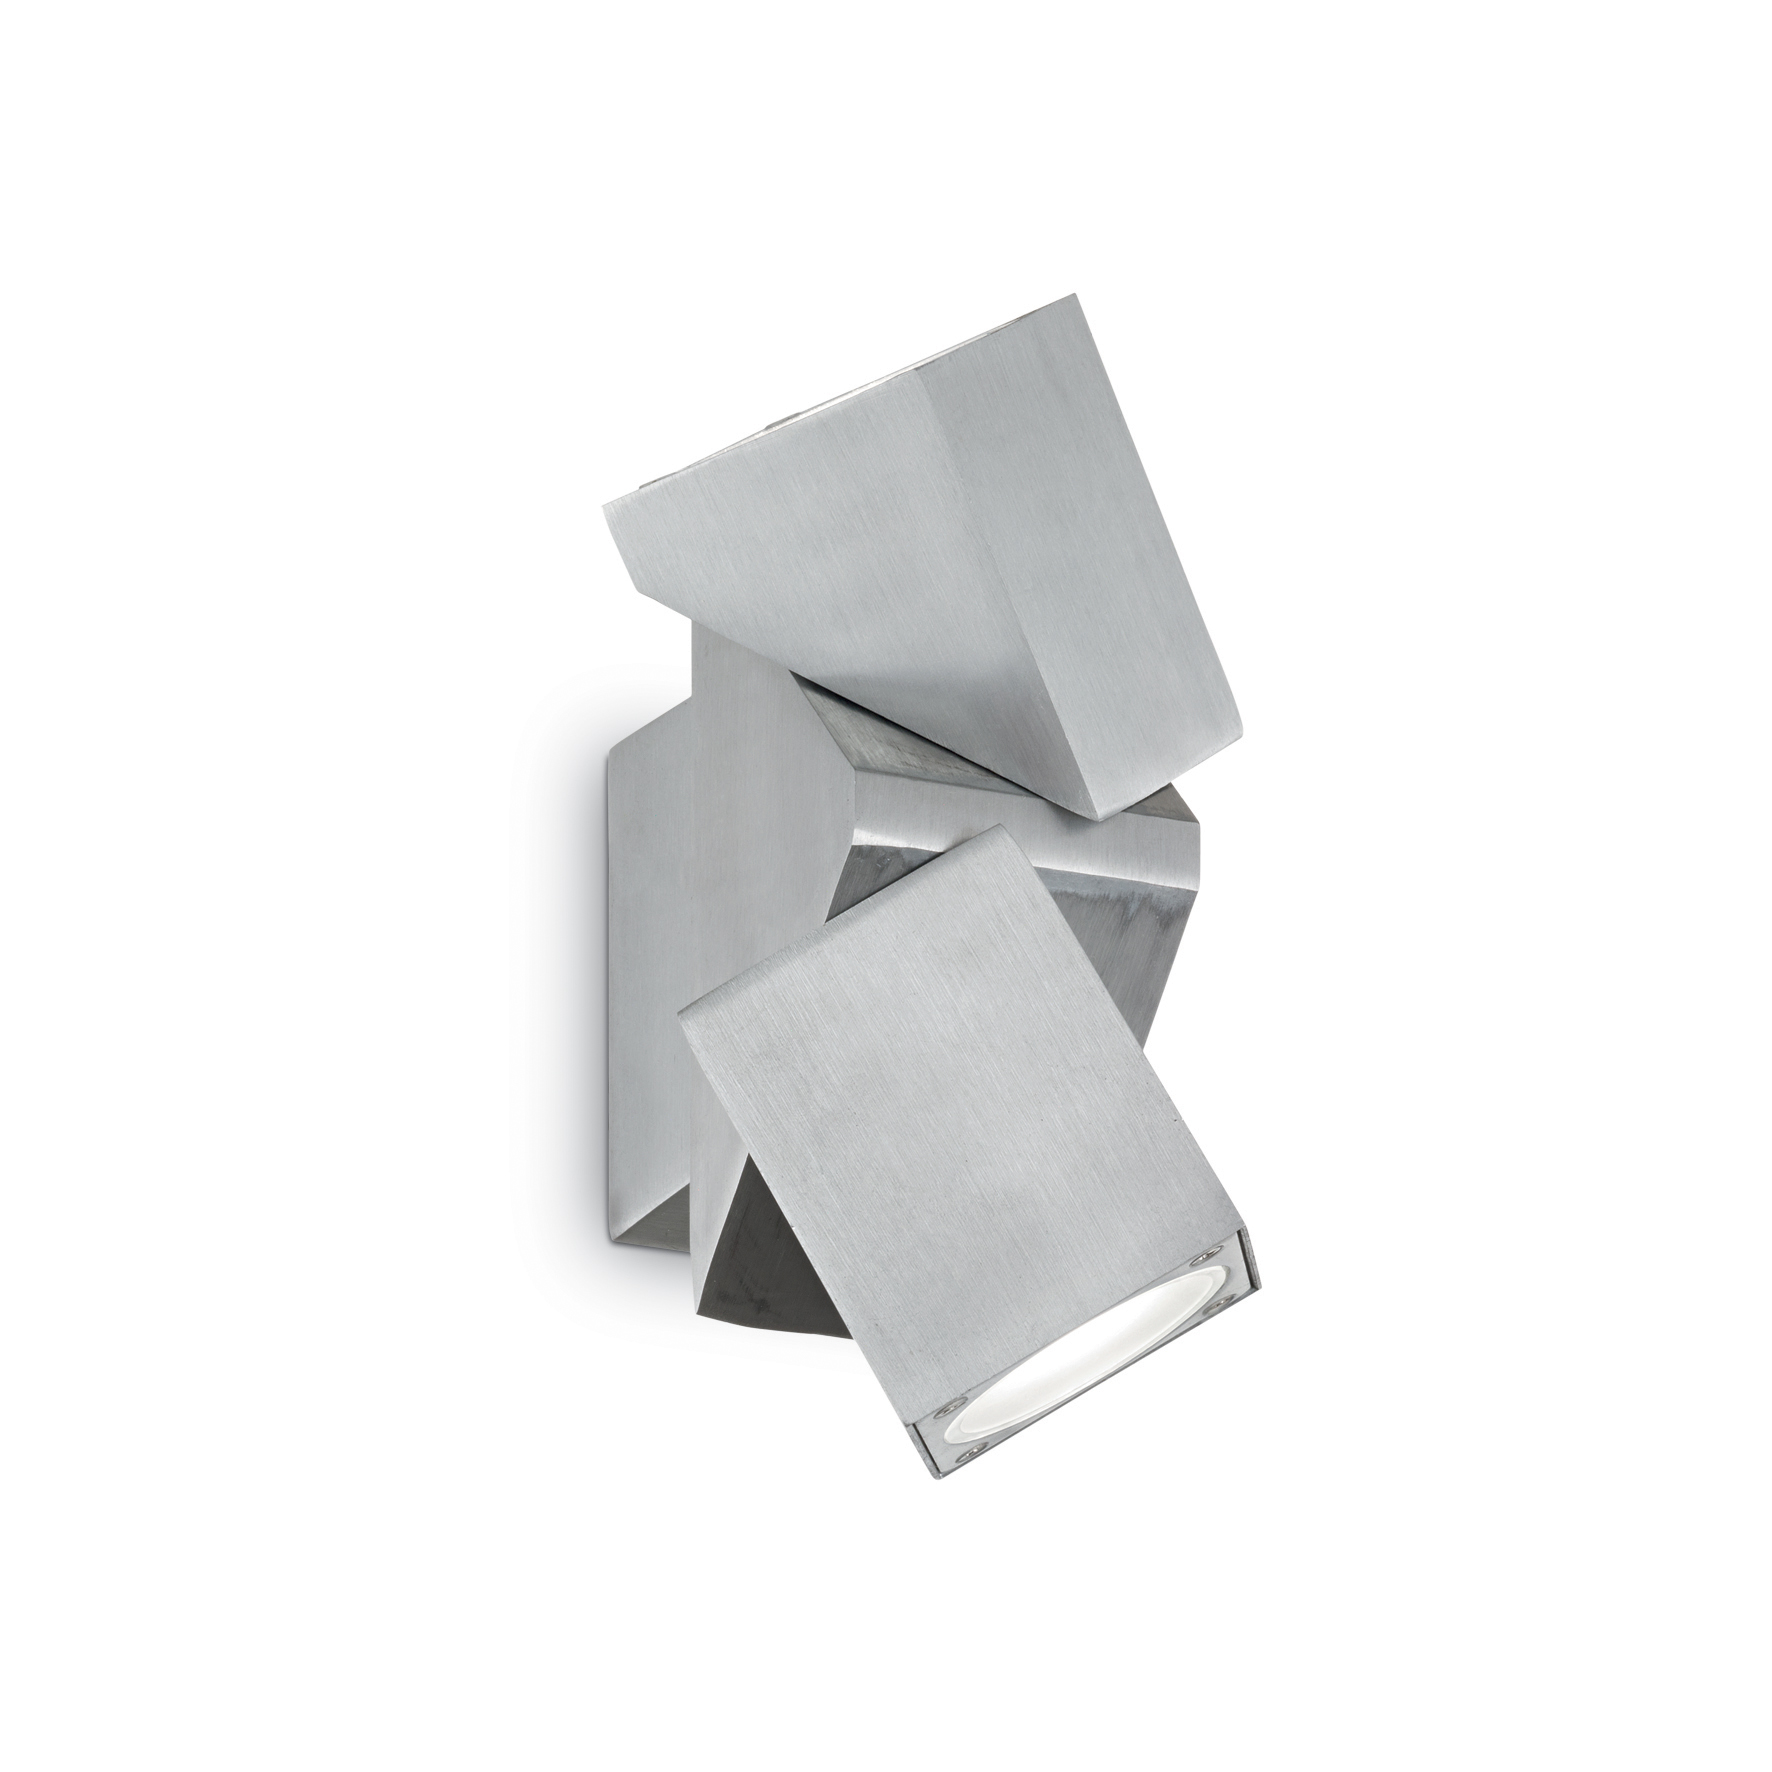 Aplica Zeus AP2 Aluminiu